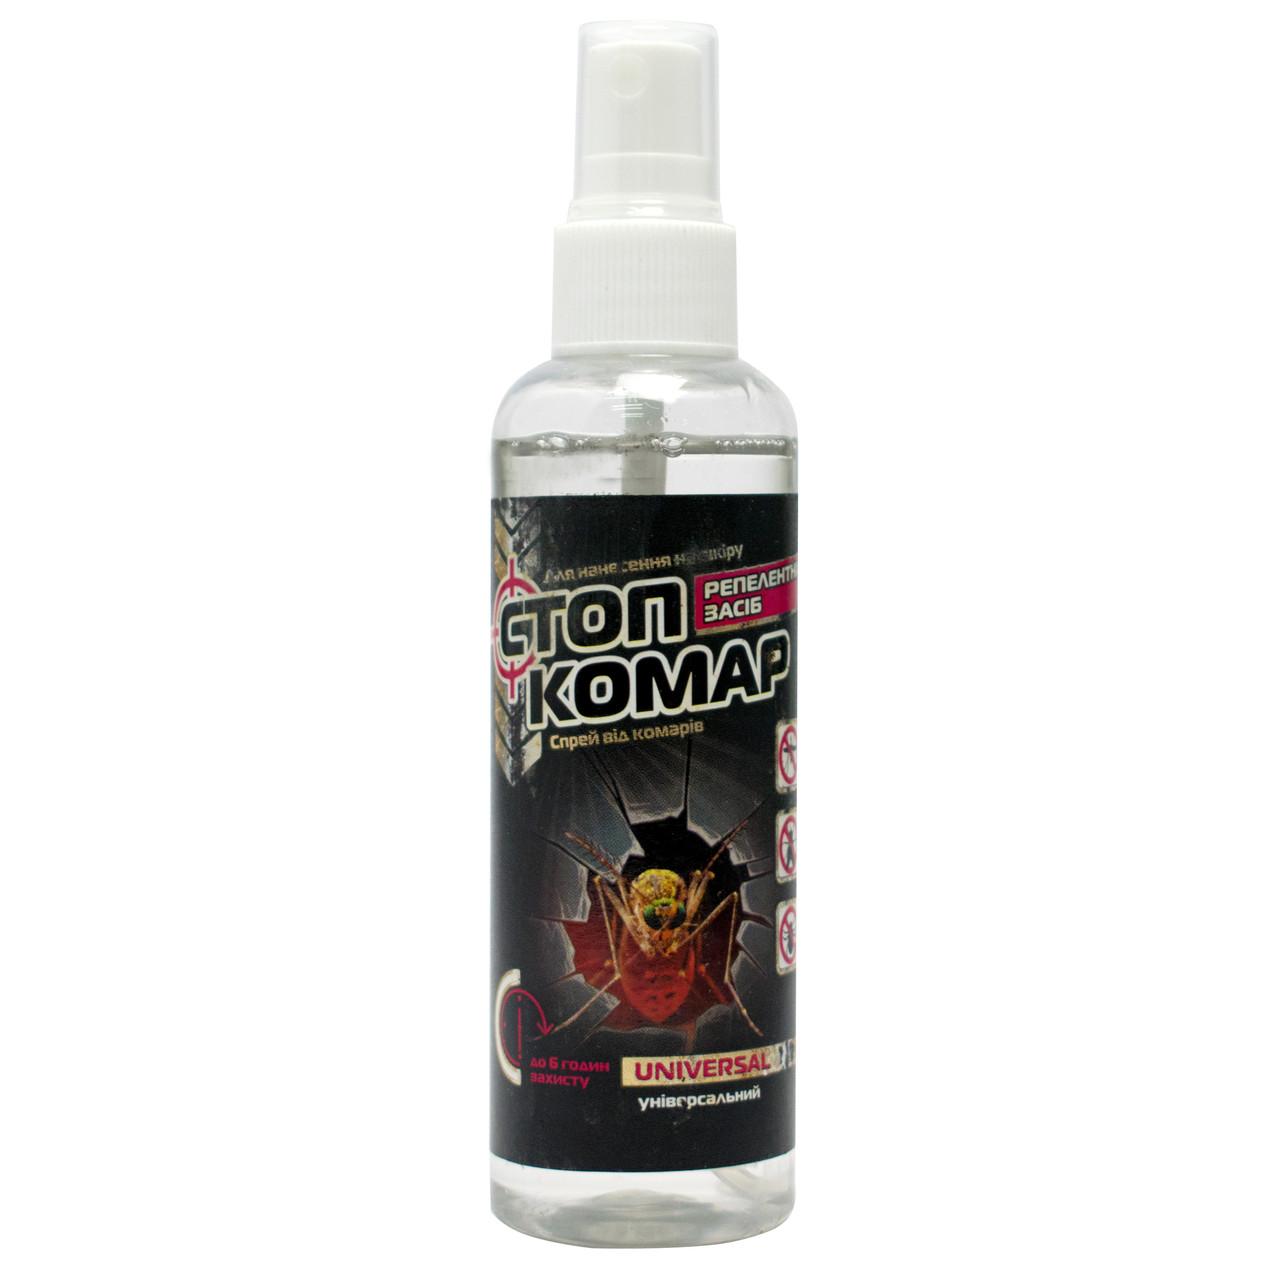 Спрей для нанесения на кожу Стоп комар 120 мл